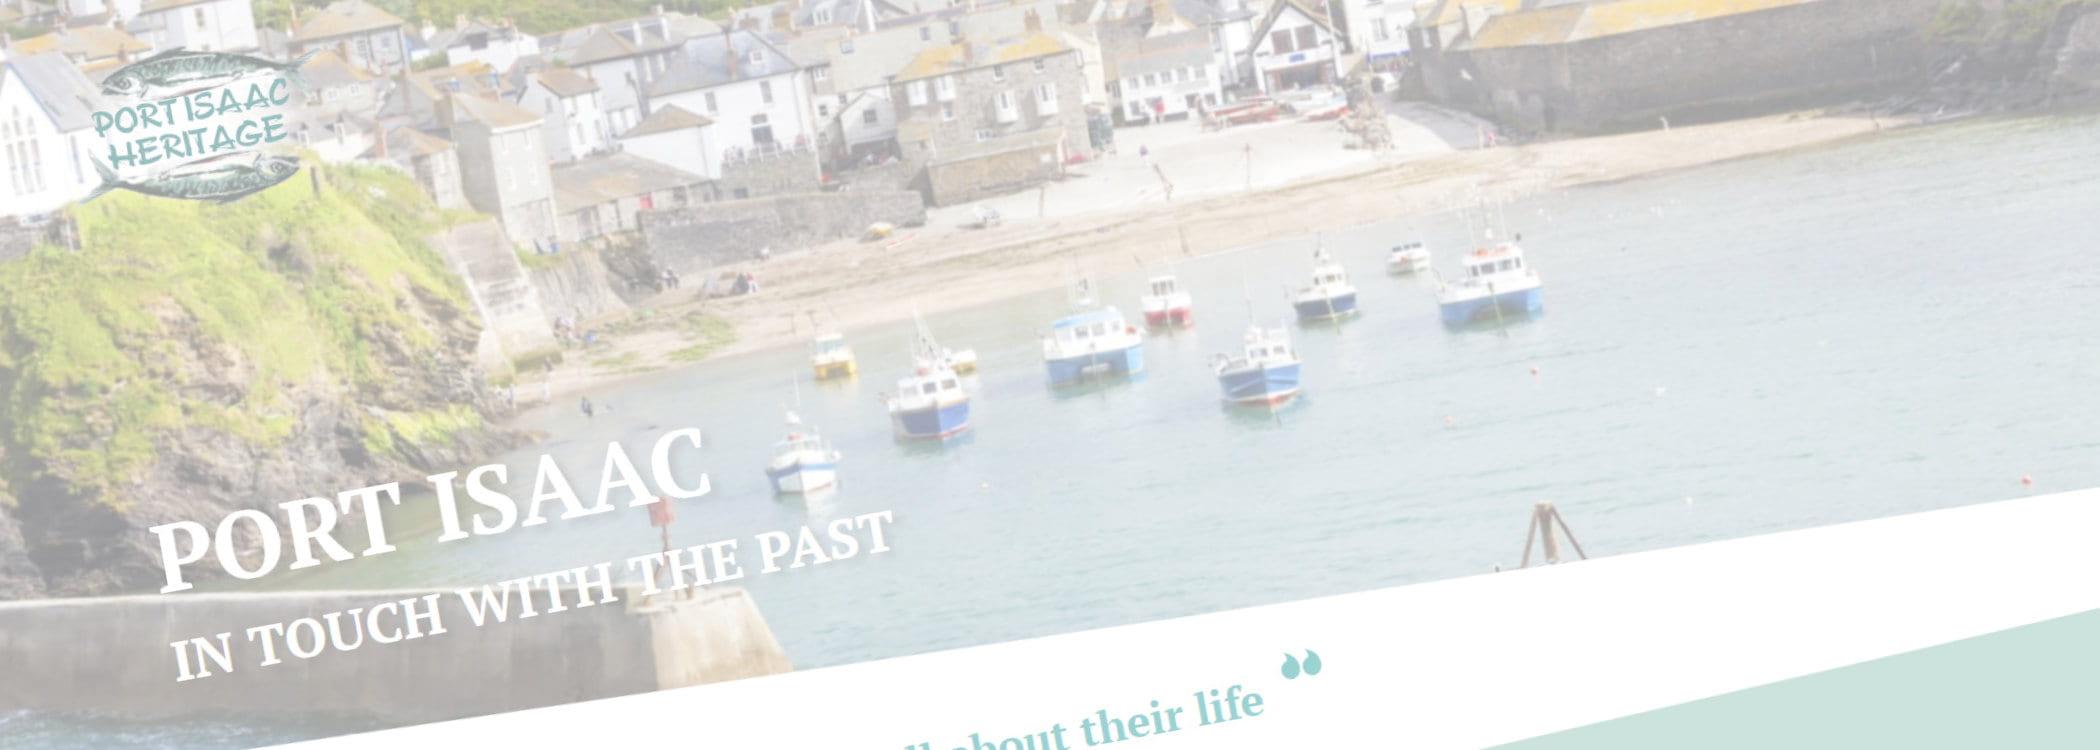 Port Issac Website